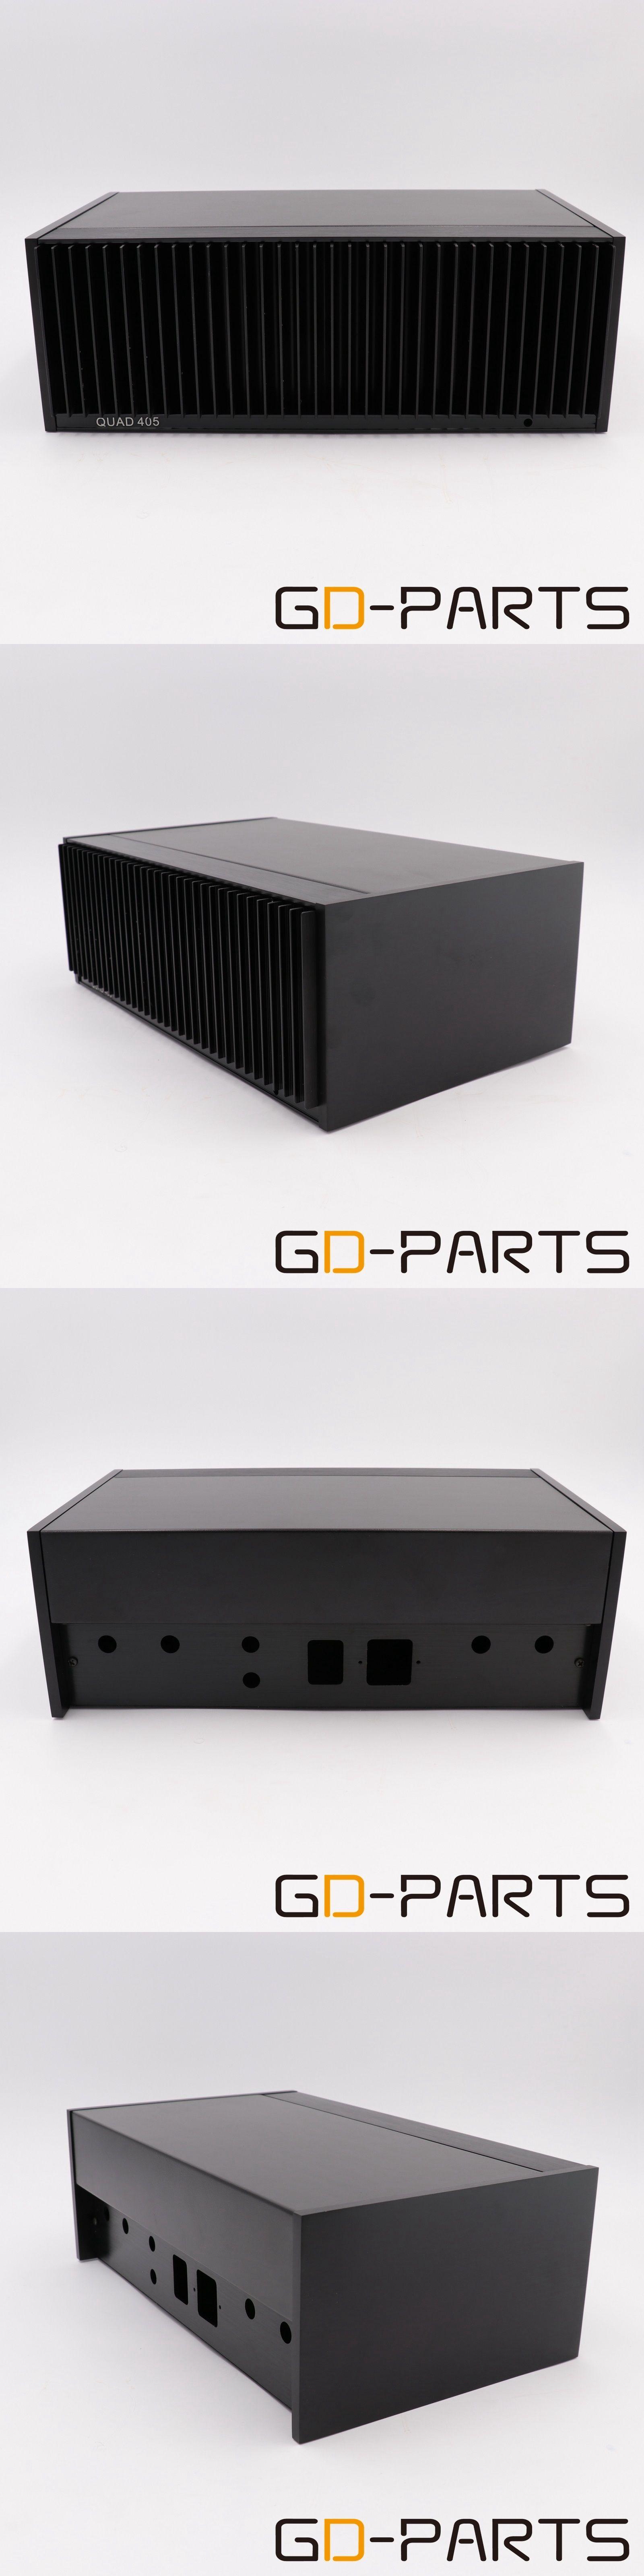 Amplifier Parts and Components: Black Aluminum Steel